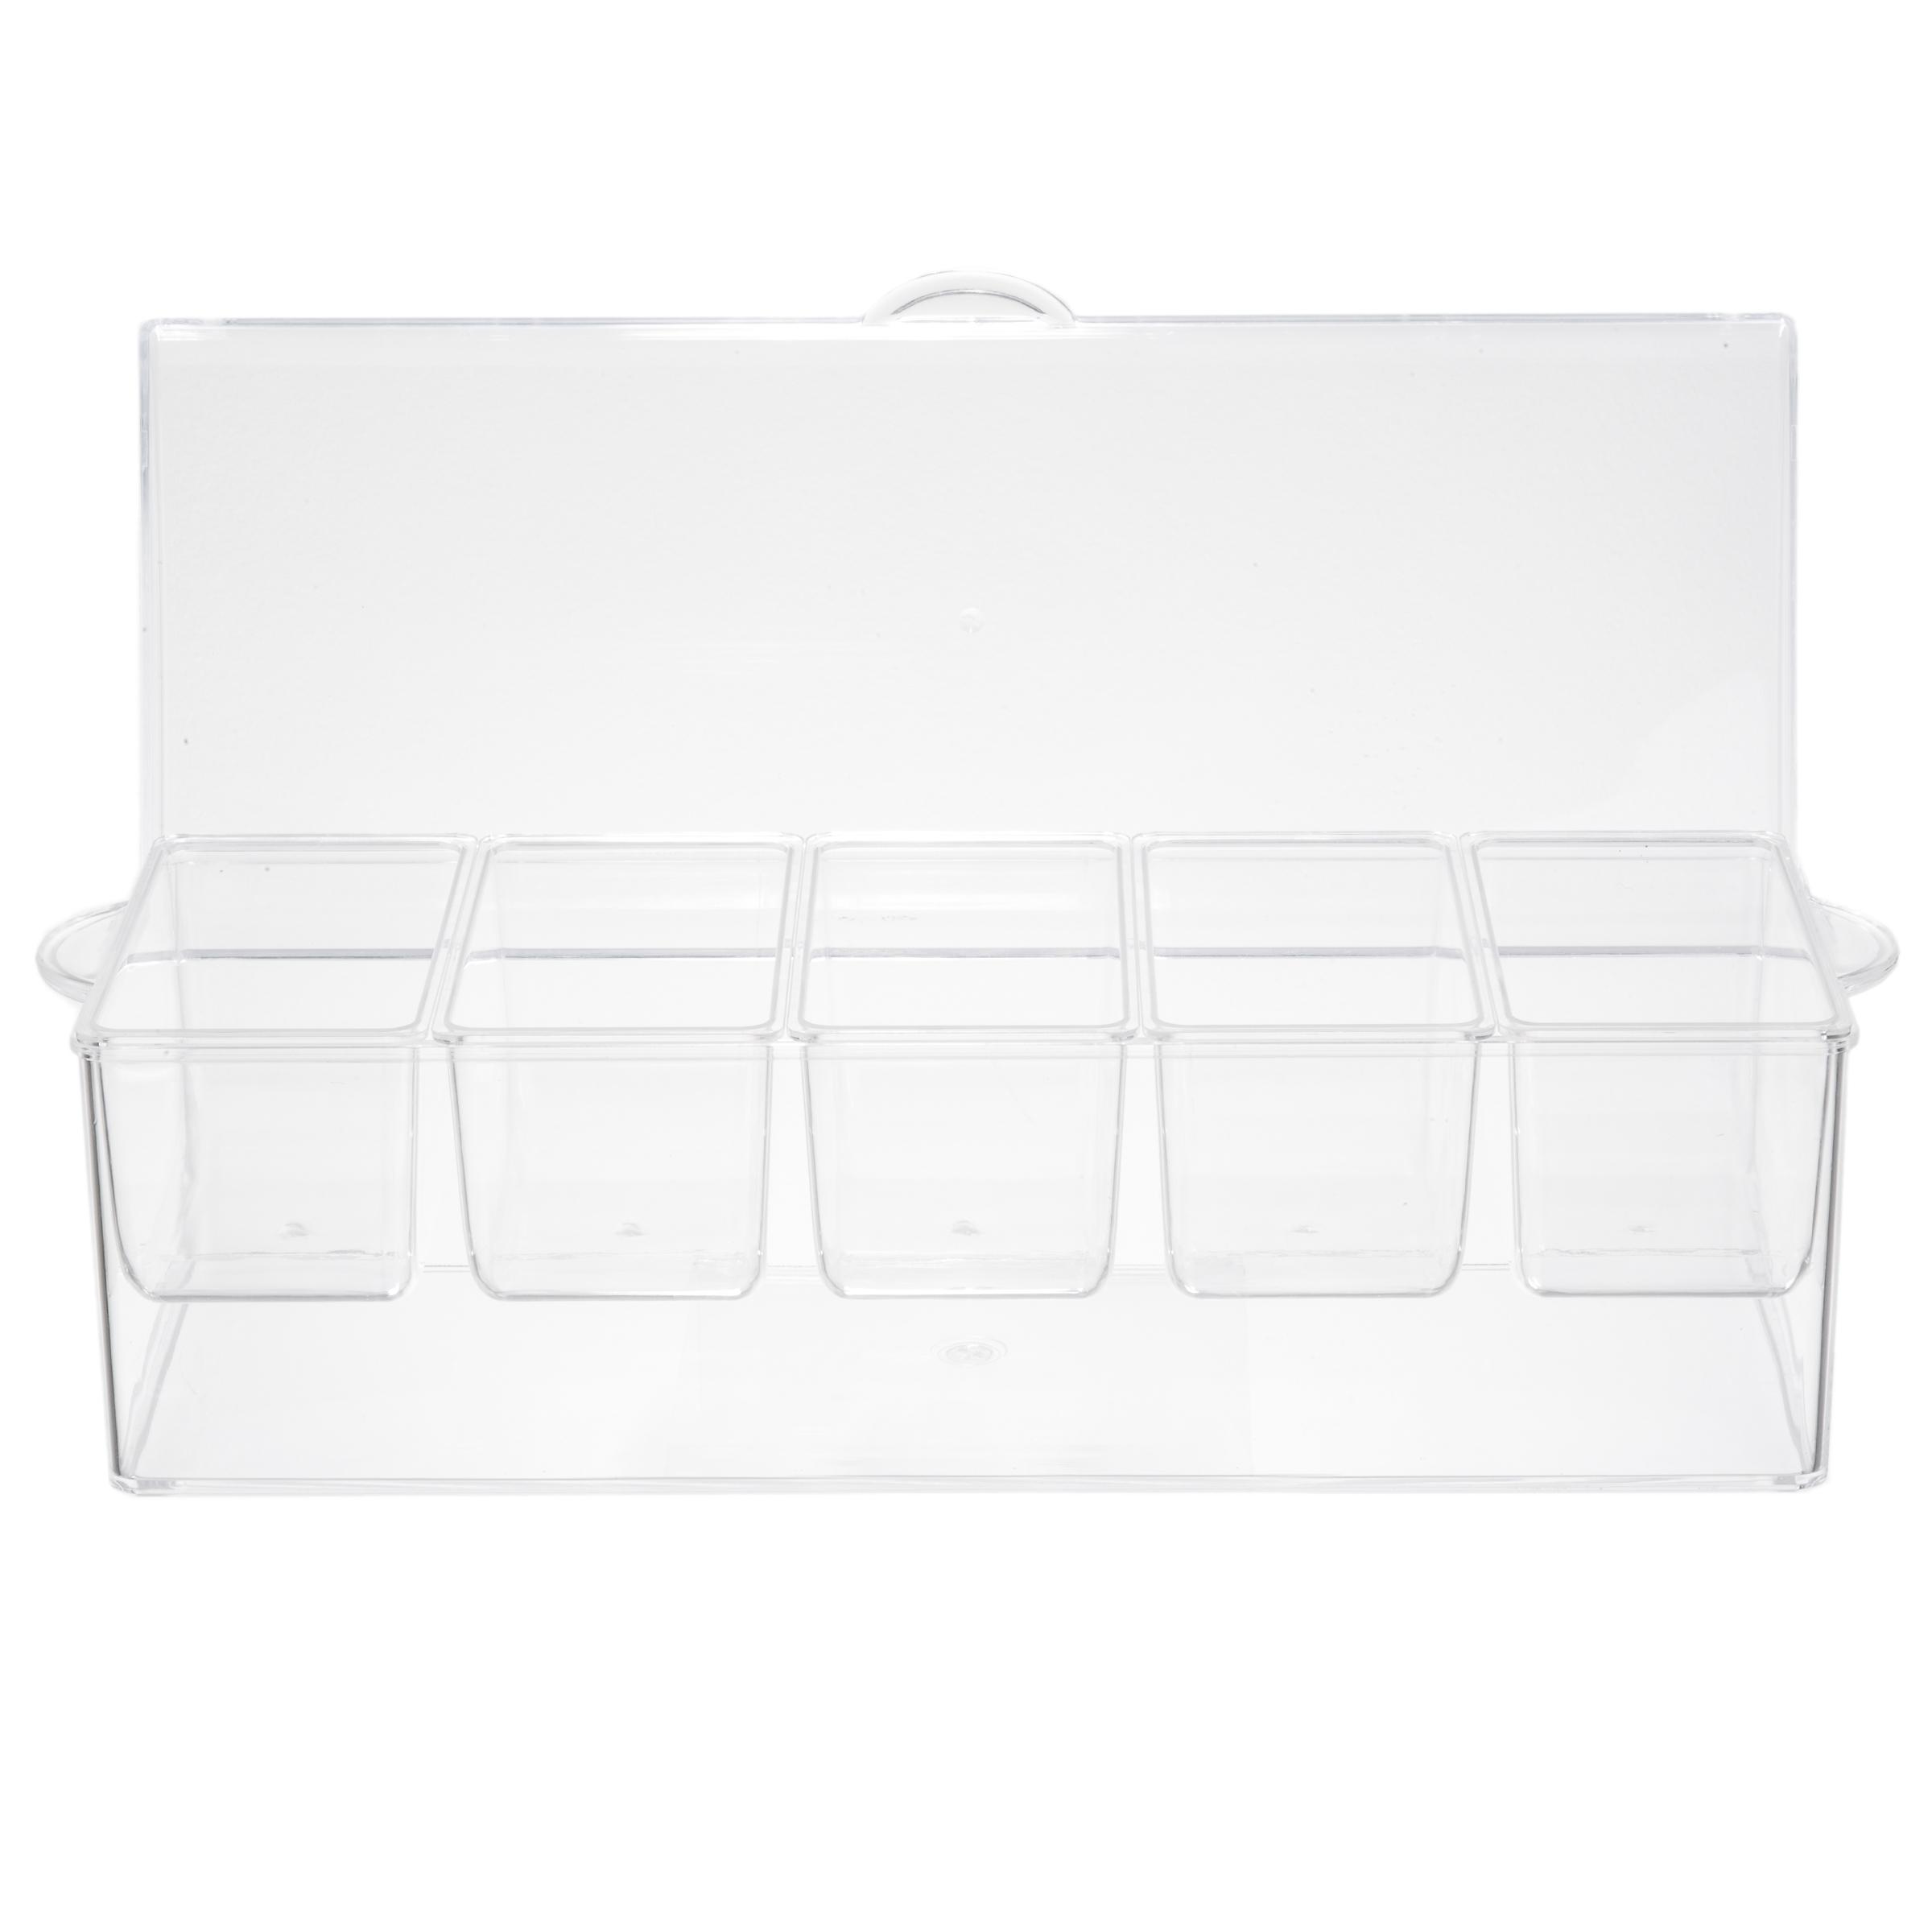 TableCraft Products 10007 bar supplies & equipment